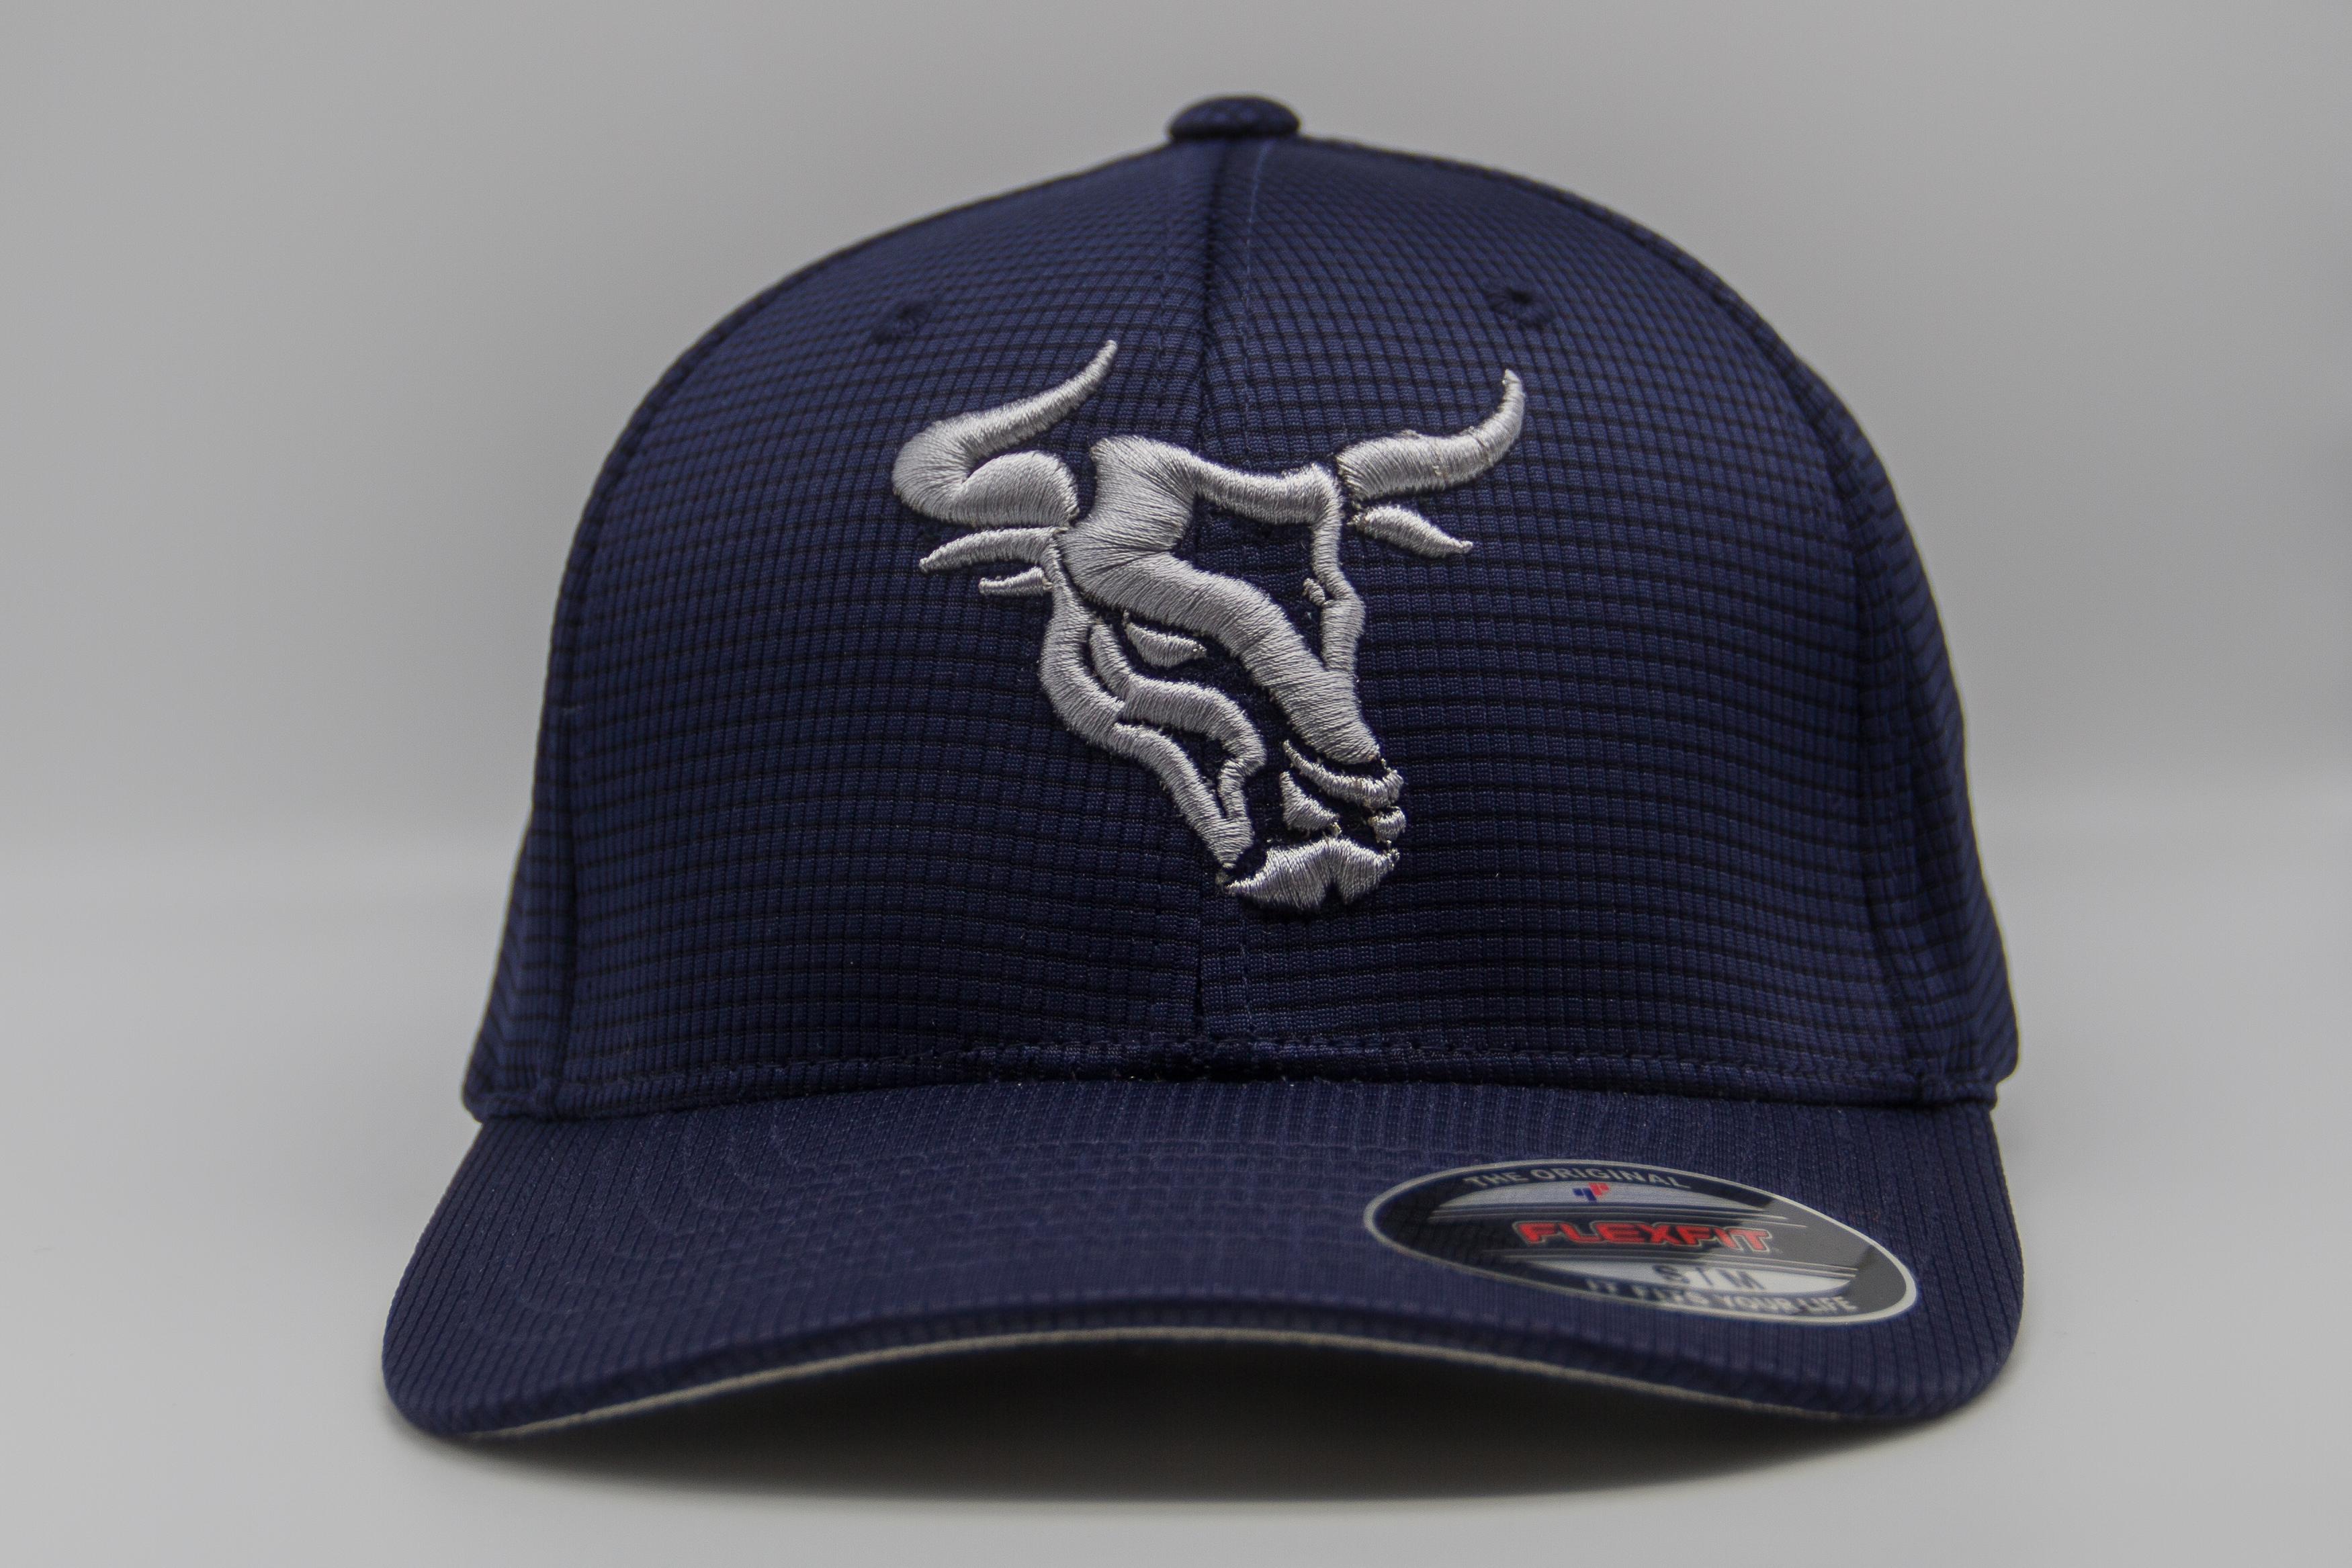 Beefcake Sport Tek Flexfit Grid Texture Cap Shop for mens hats & caps in mens hats, gloves & scarves. deweze gear 3dcart